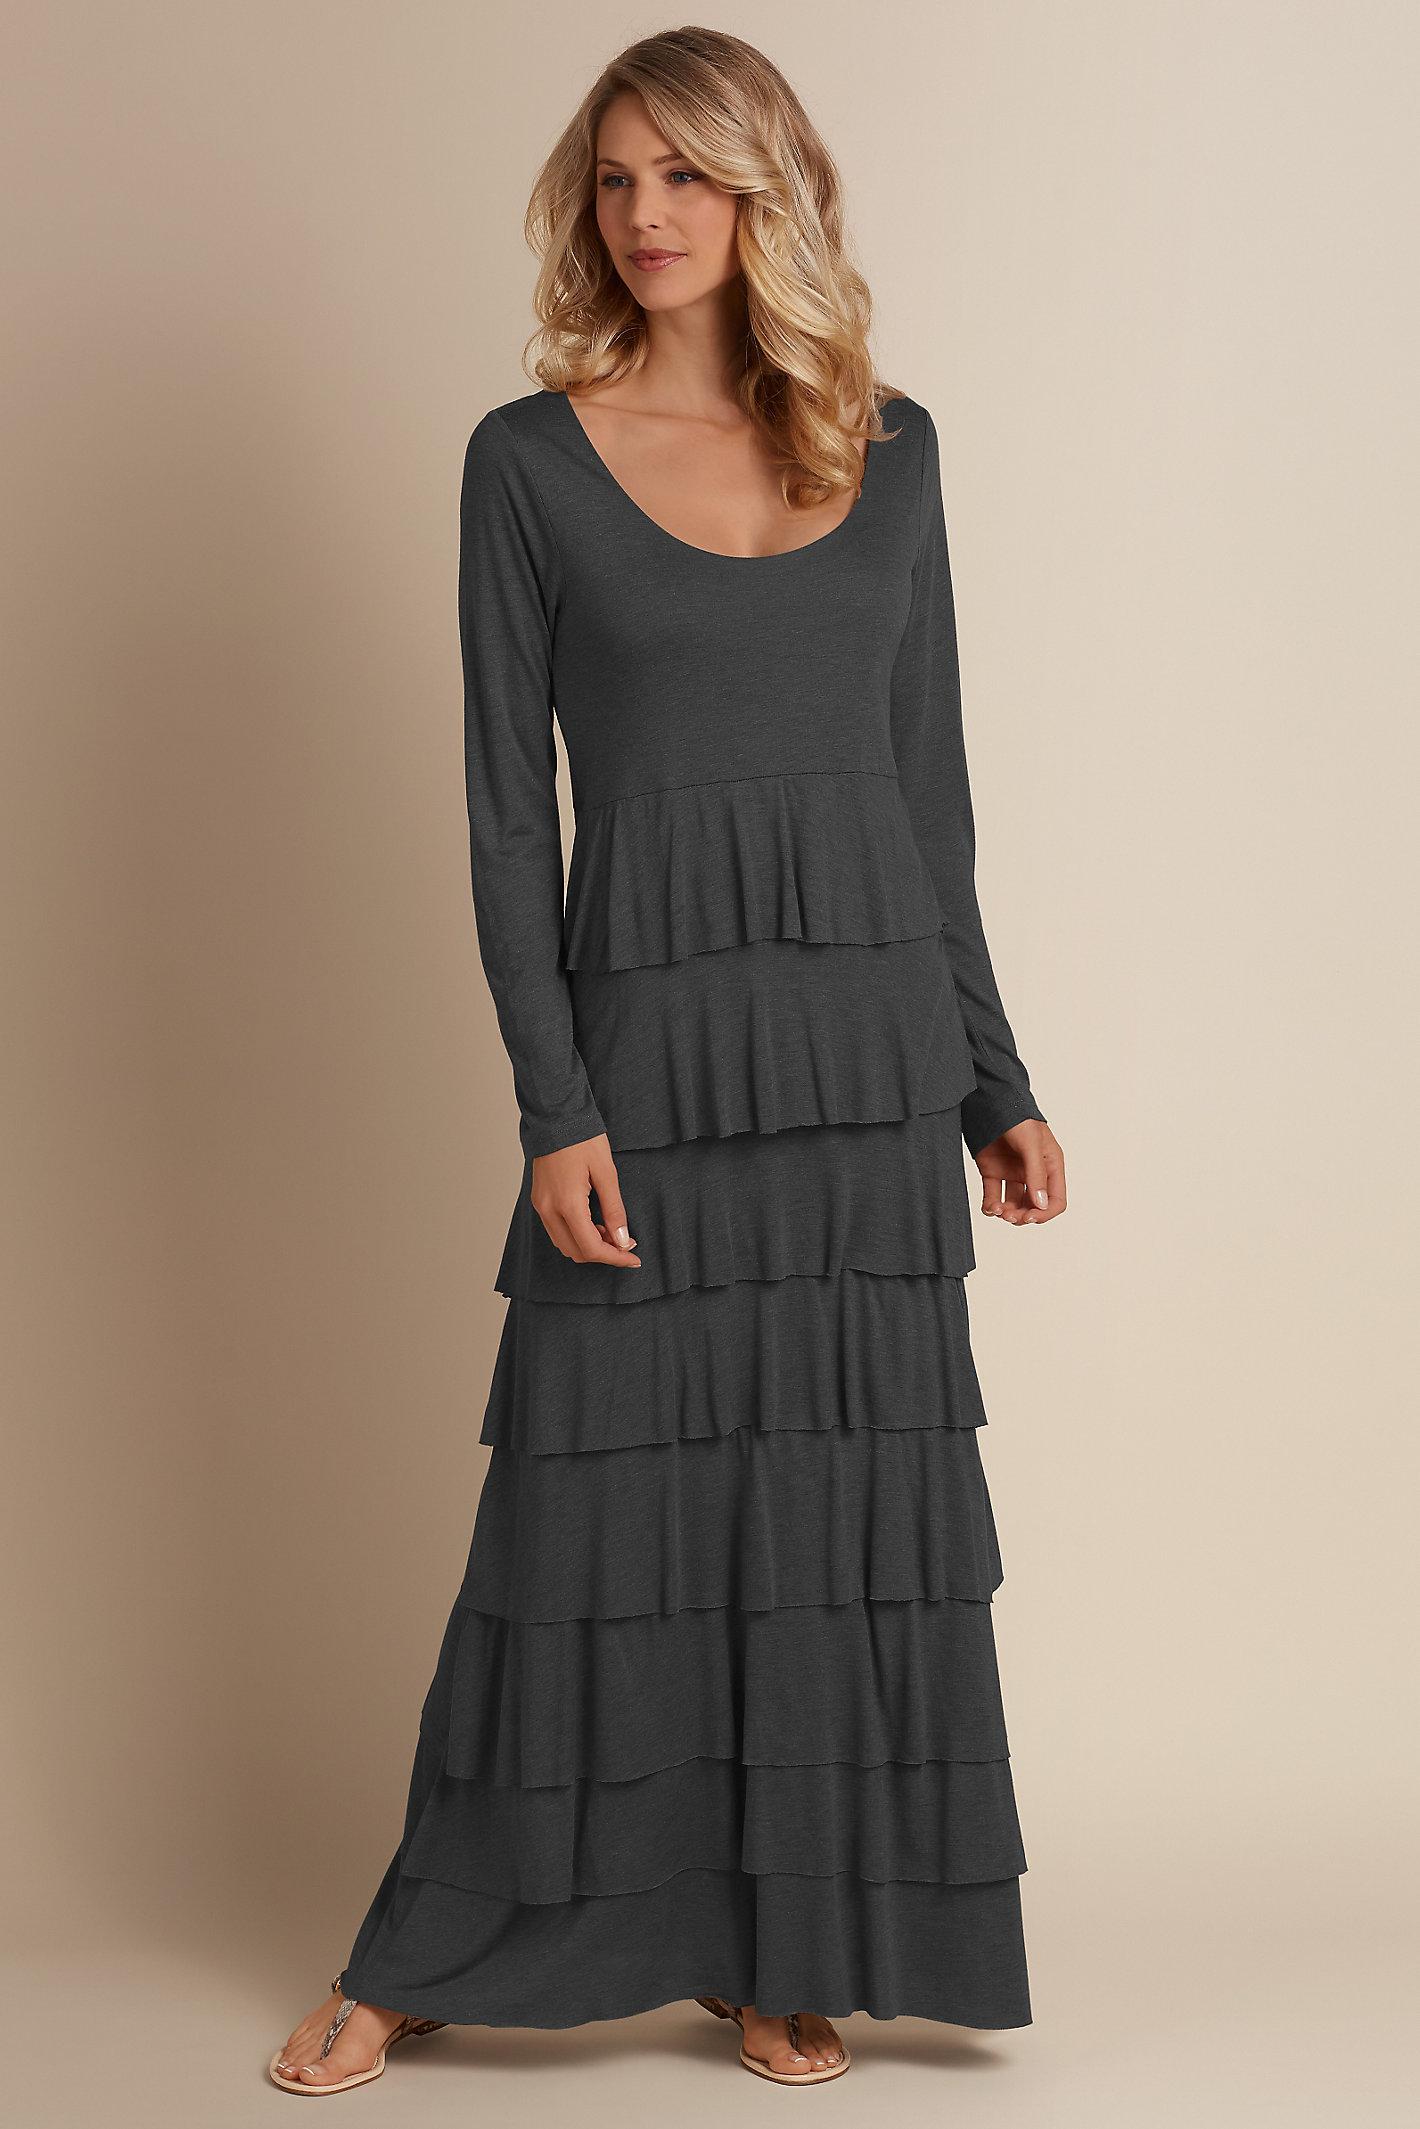 Fontaine Dress